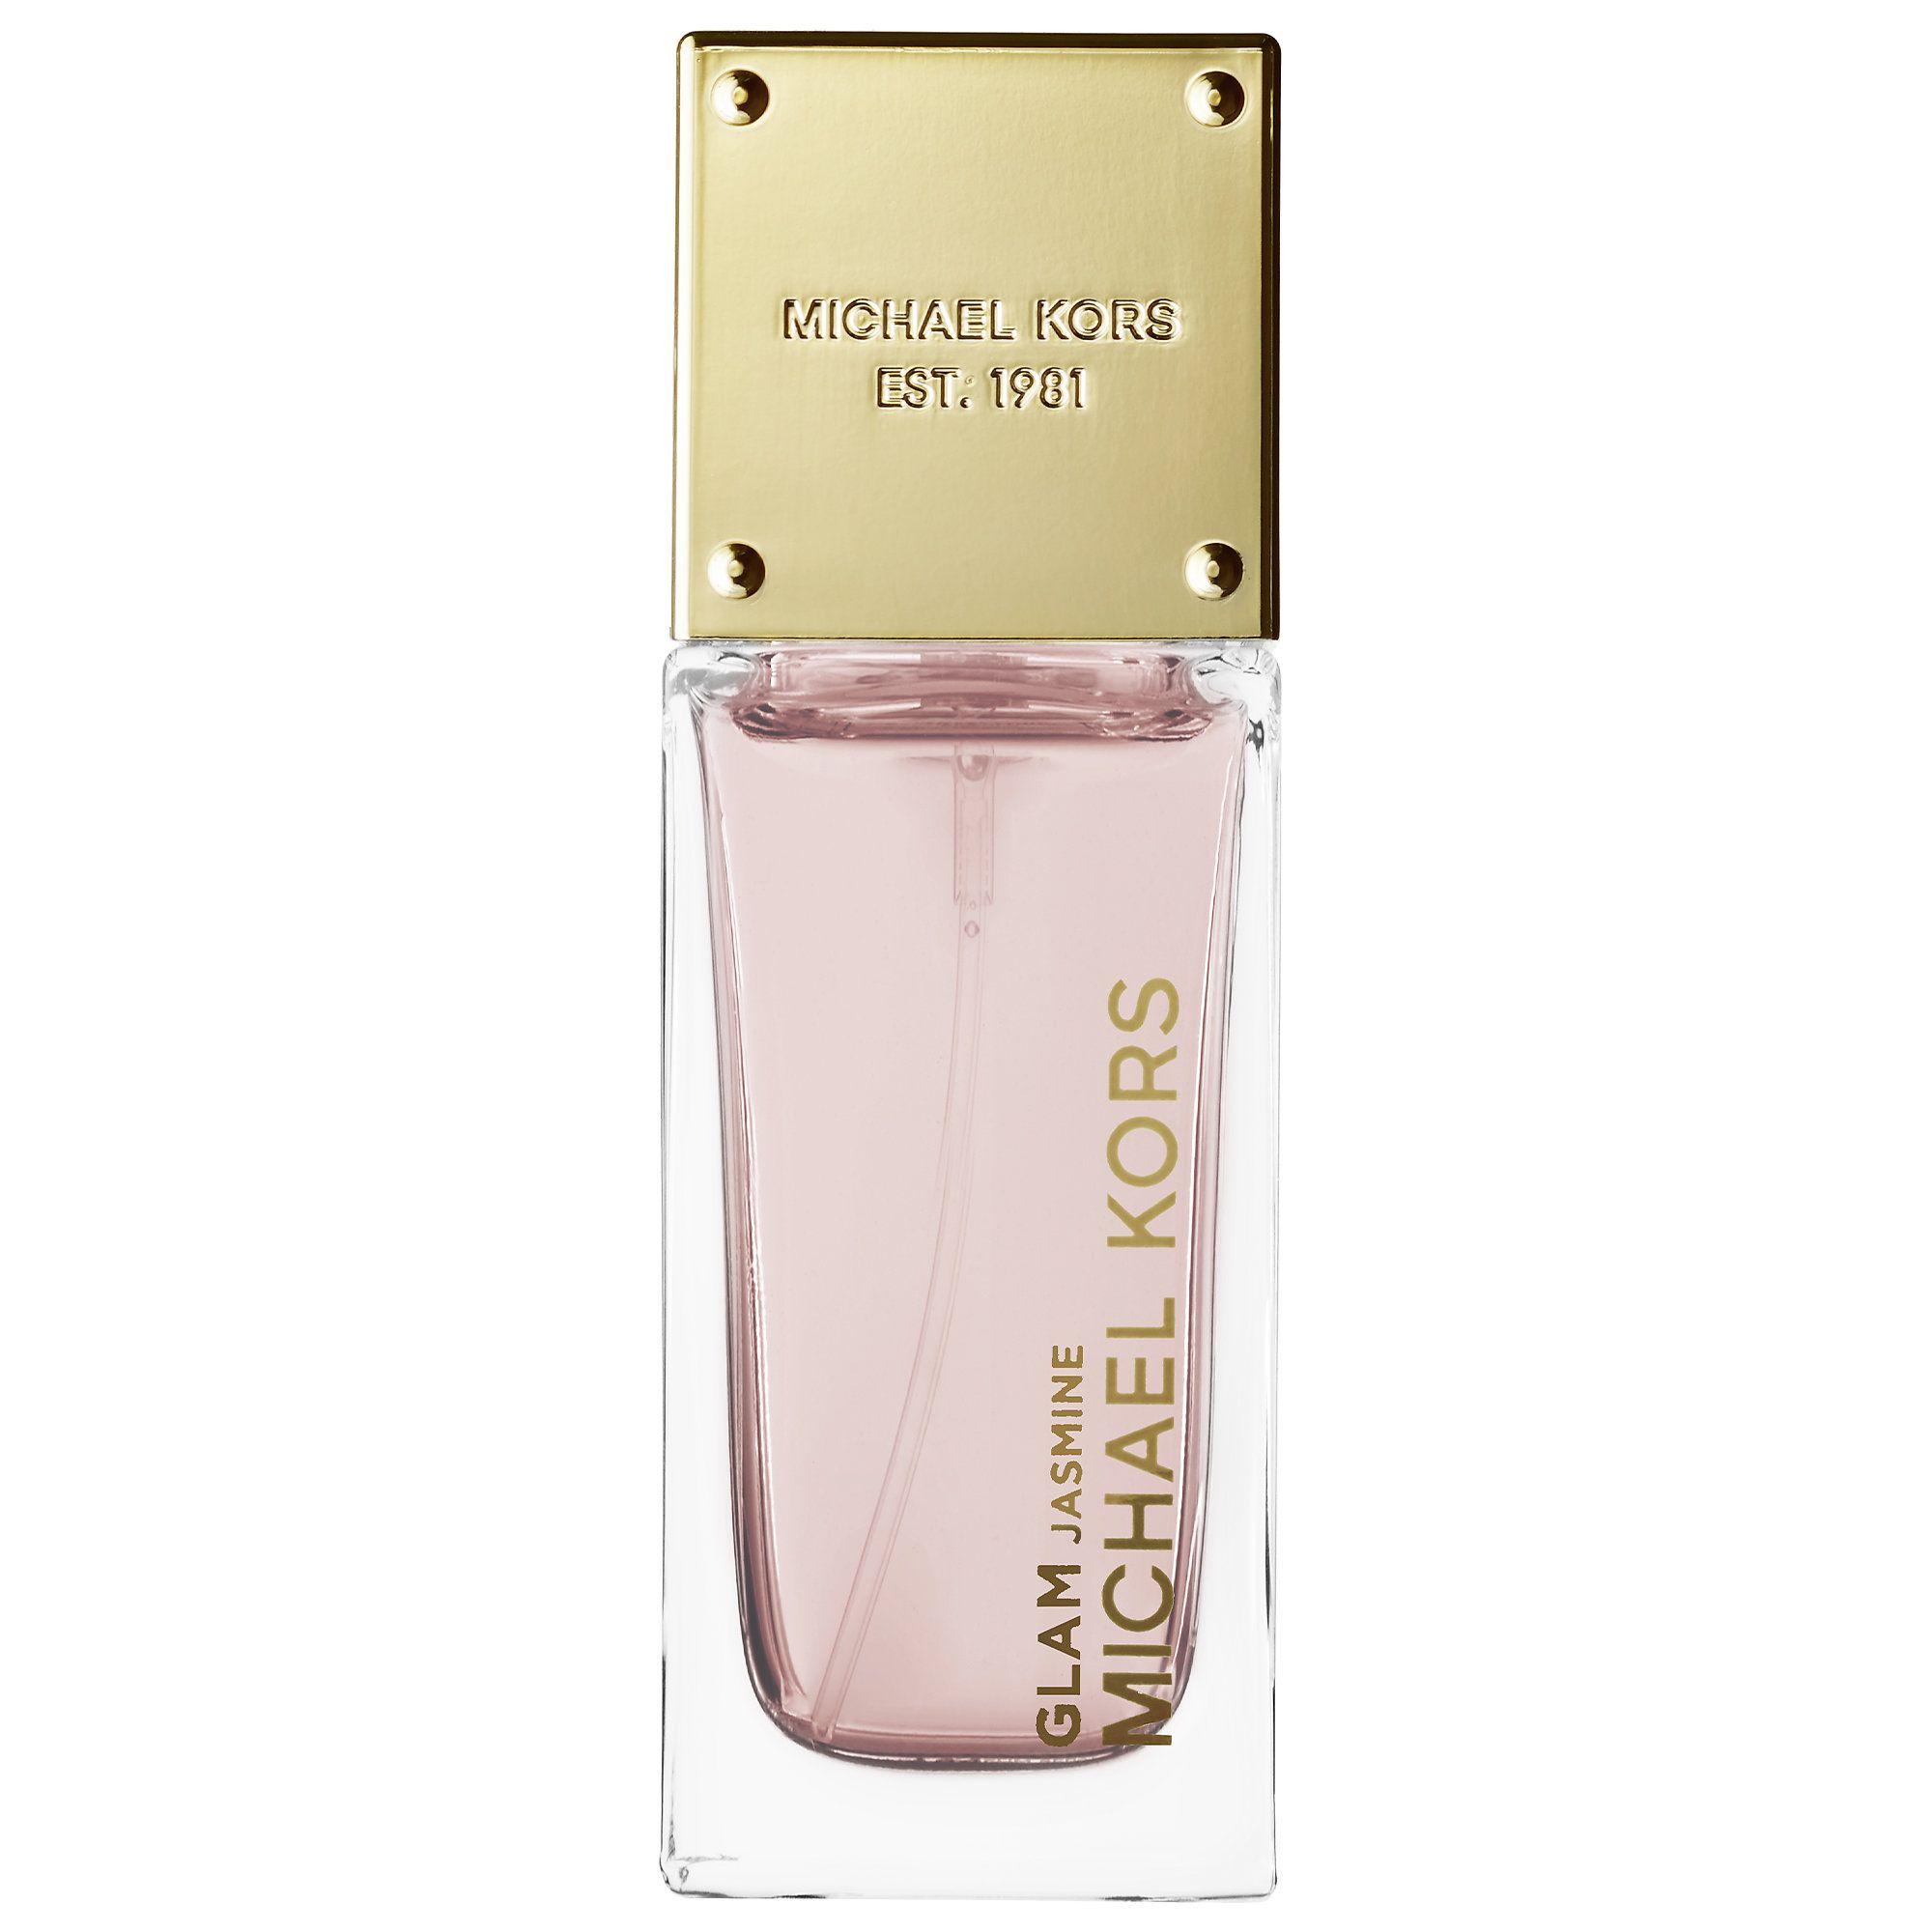 Michael Kors Glam Jasmine Sephora Fragrance Perfume Perfume Michael Kors Perfume Michael Kors Fragrance